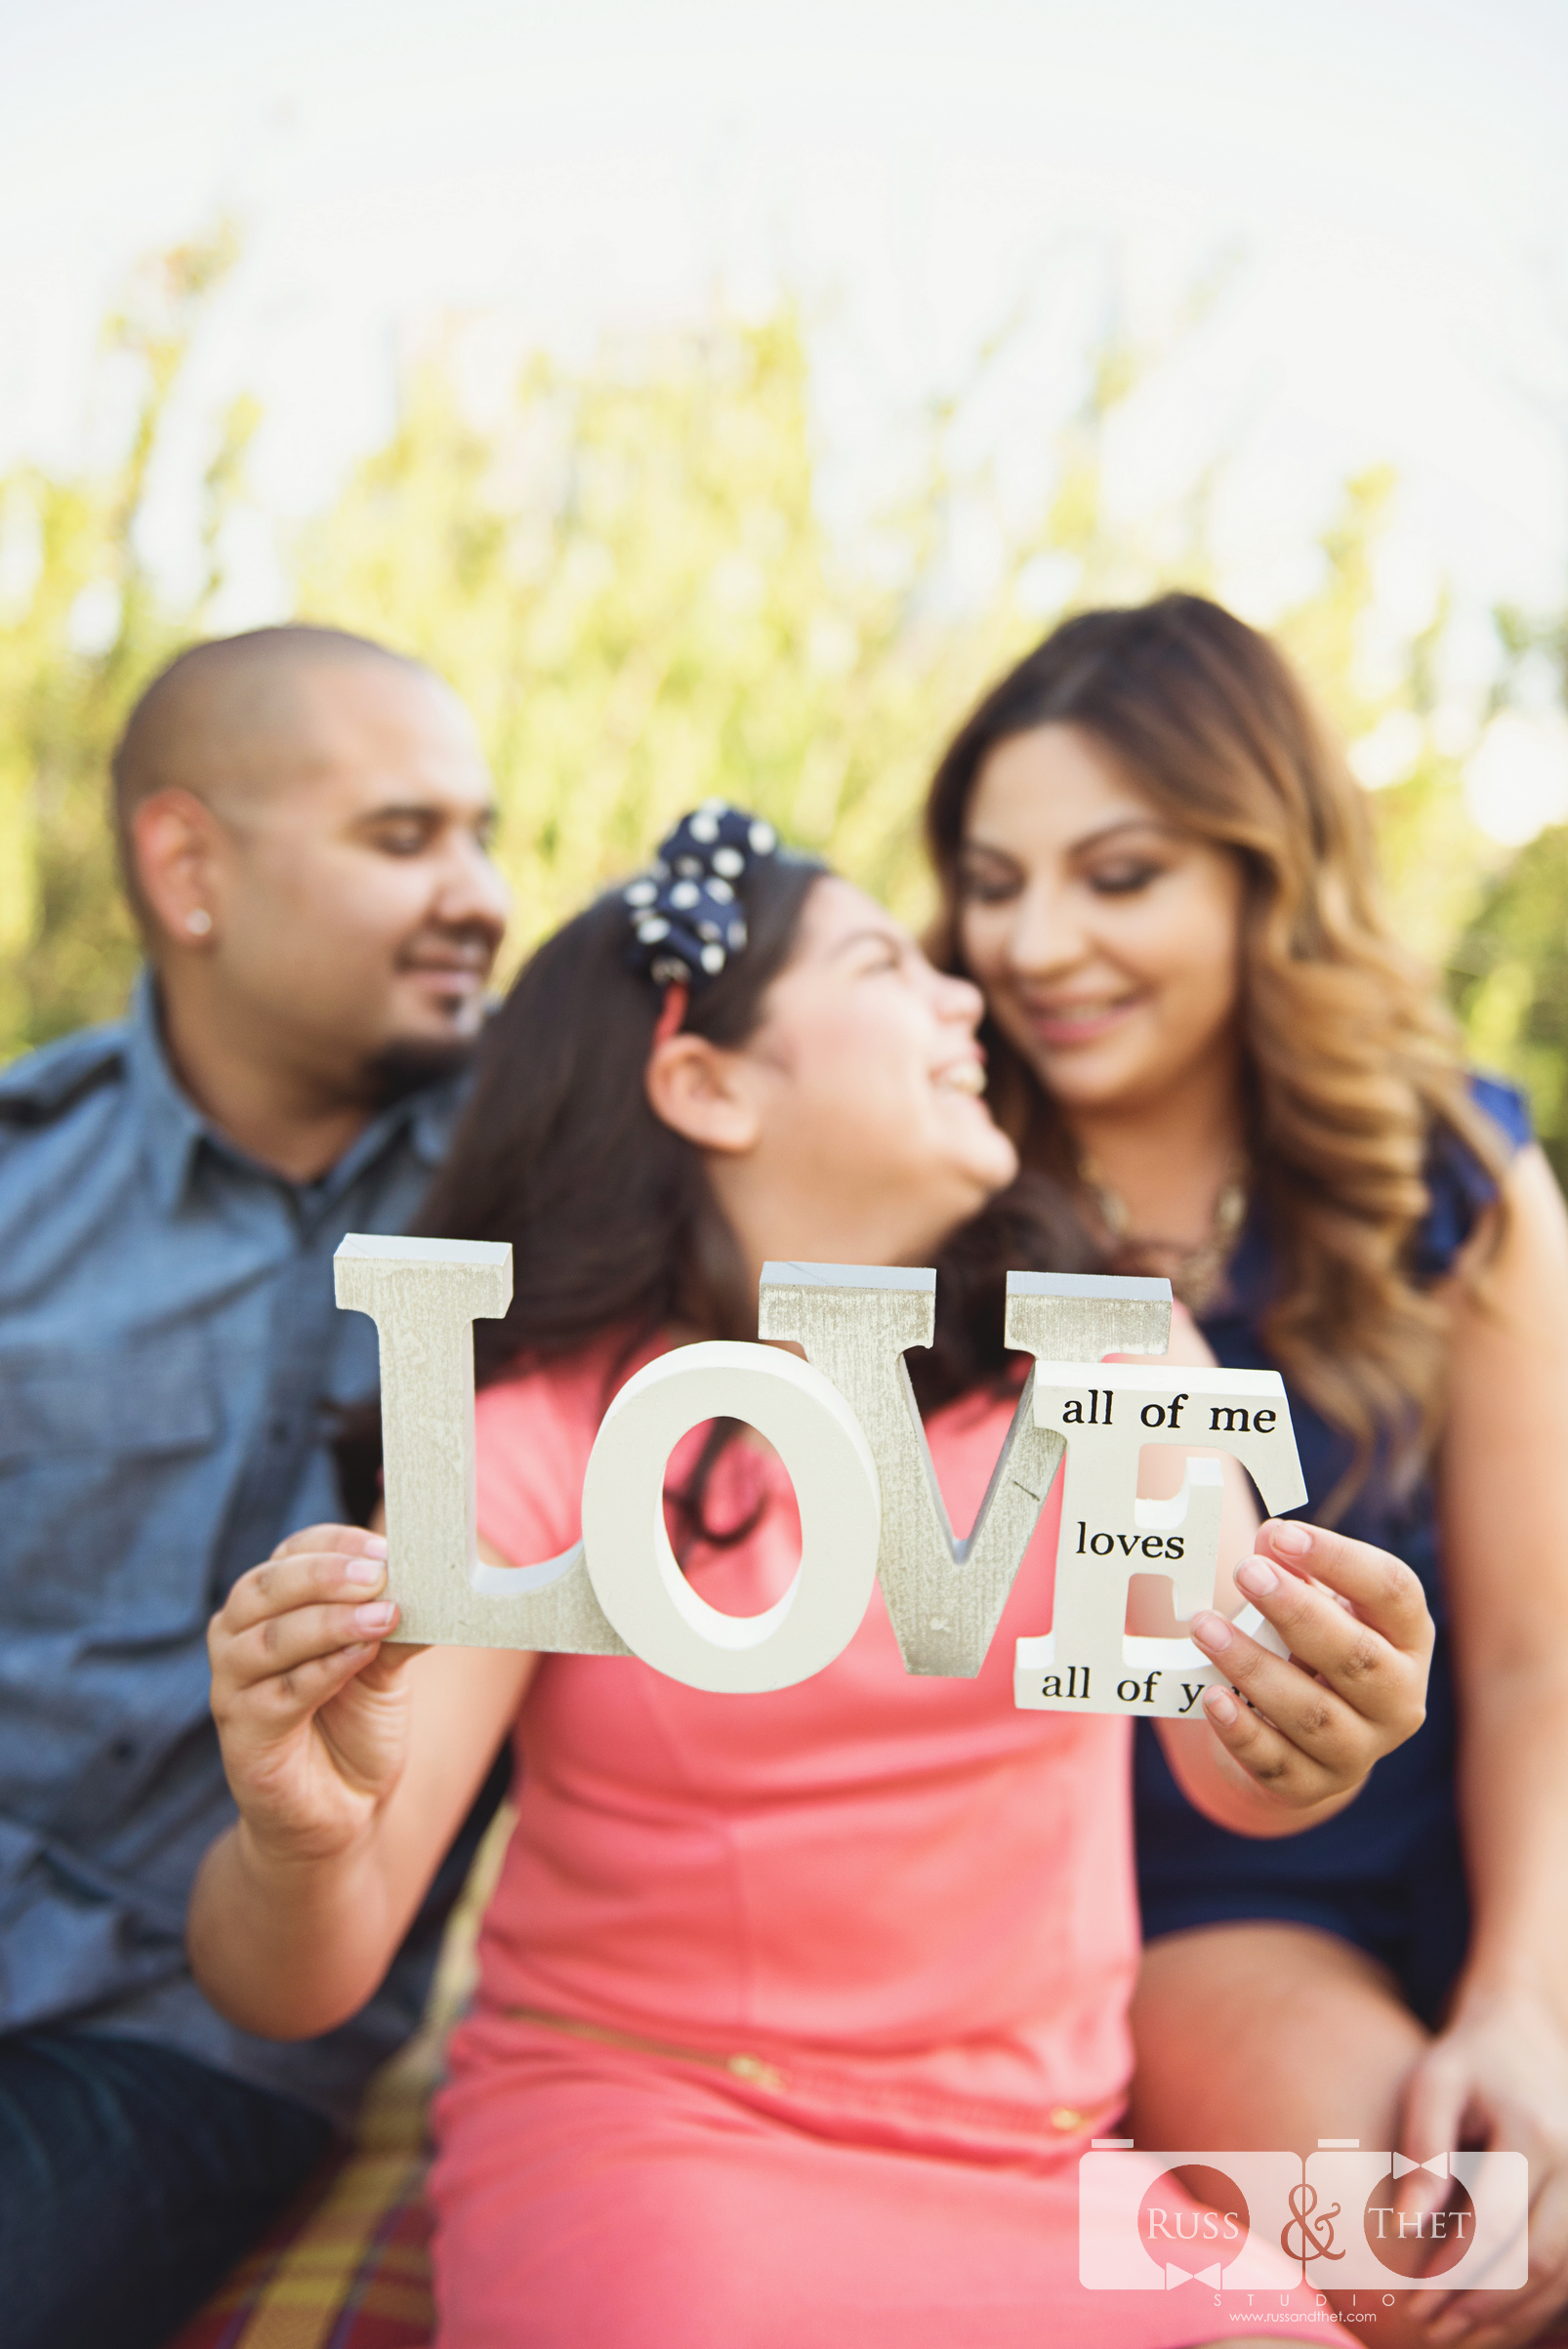 Vista-Hermosa-Park-Engagement-Photographer (5).jpg